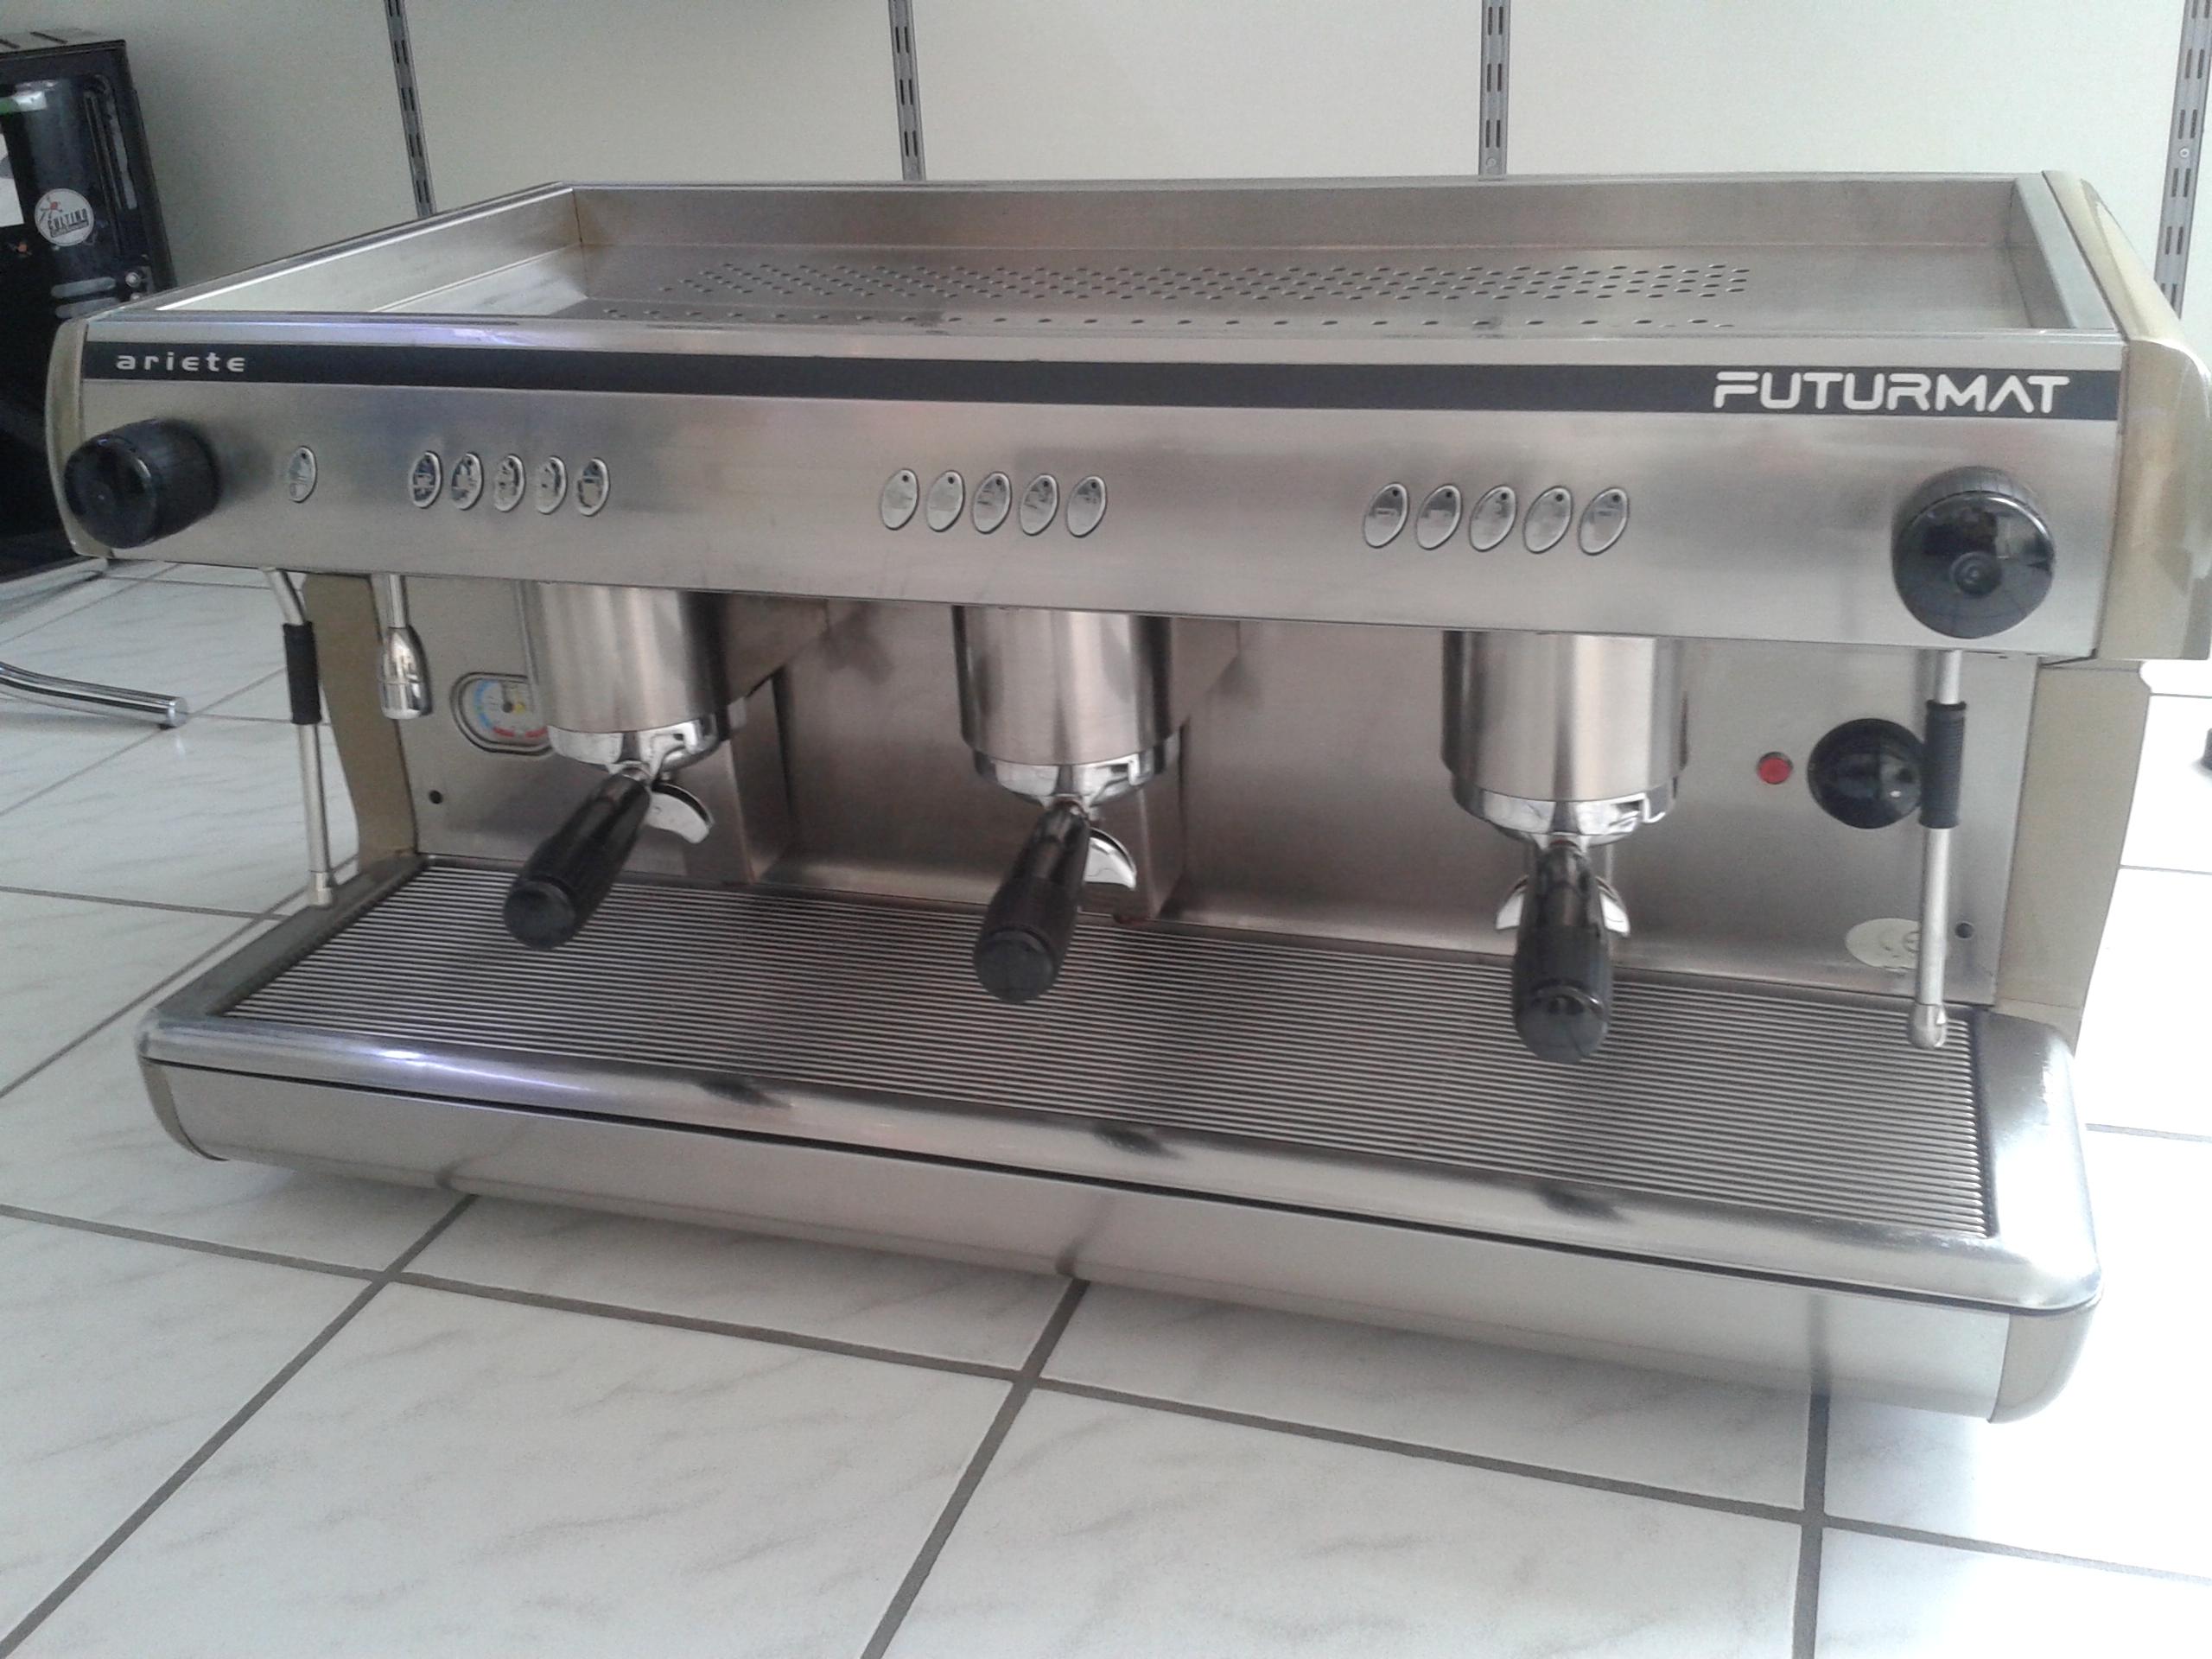 espresso service point futurmat ariete siebtr ger. Black Bedroom Furniture Sets. Home Design Ideas